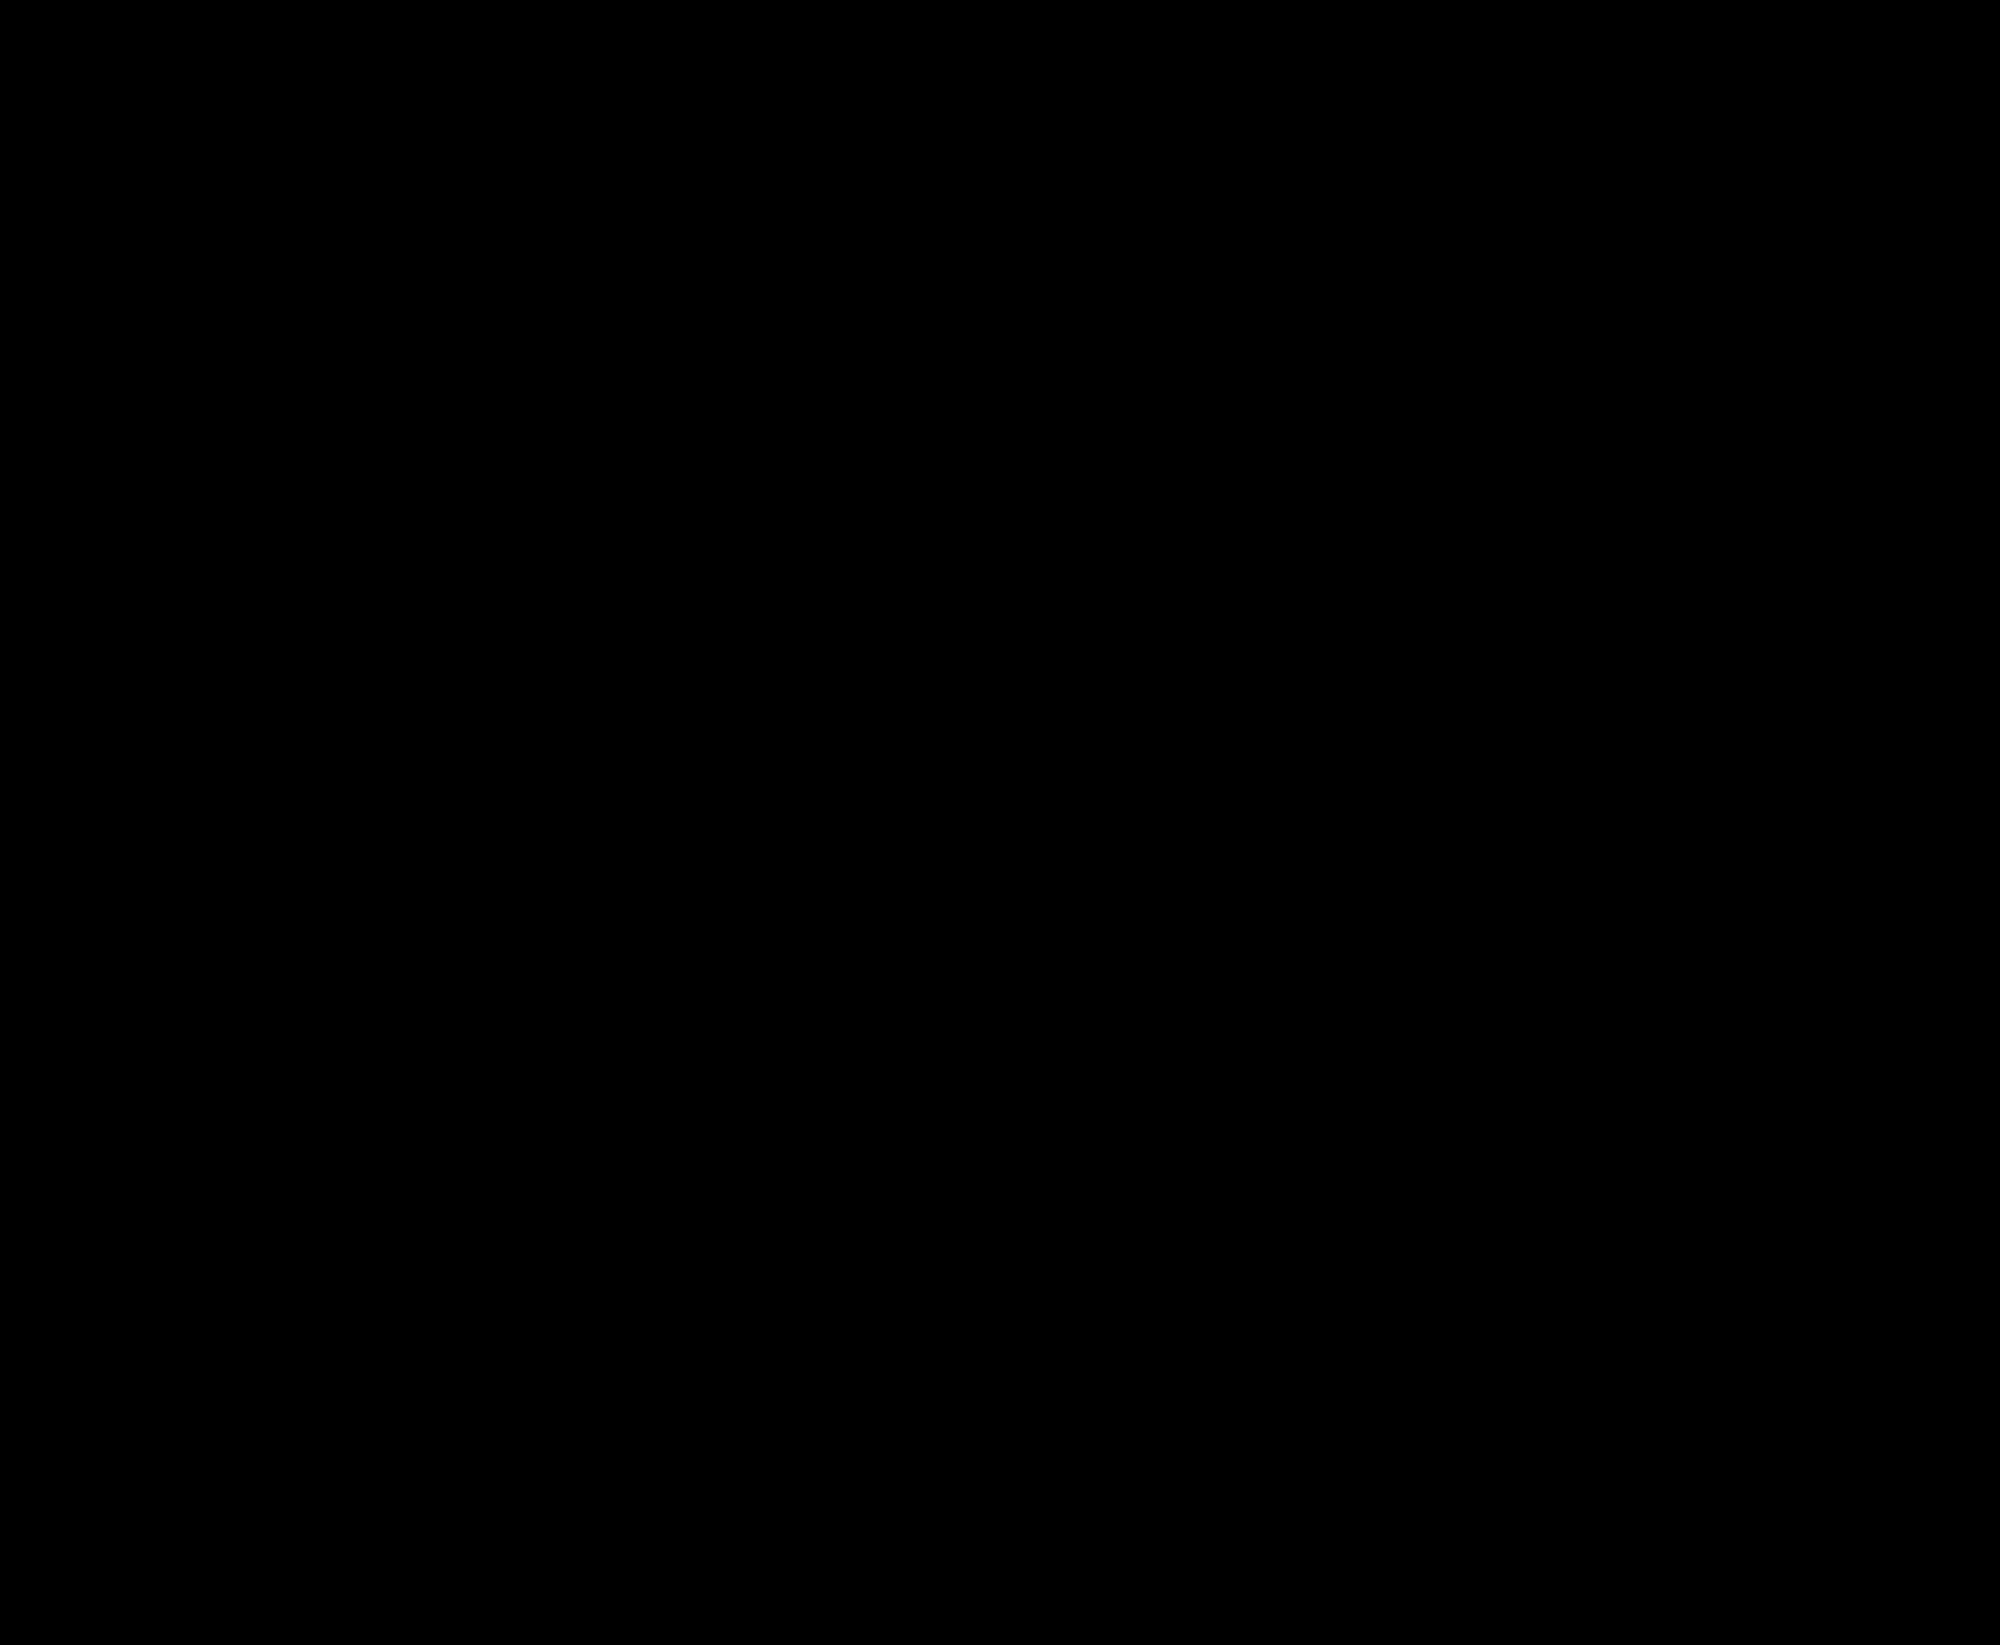 phpvLzuSi